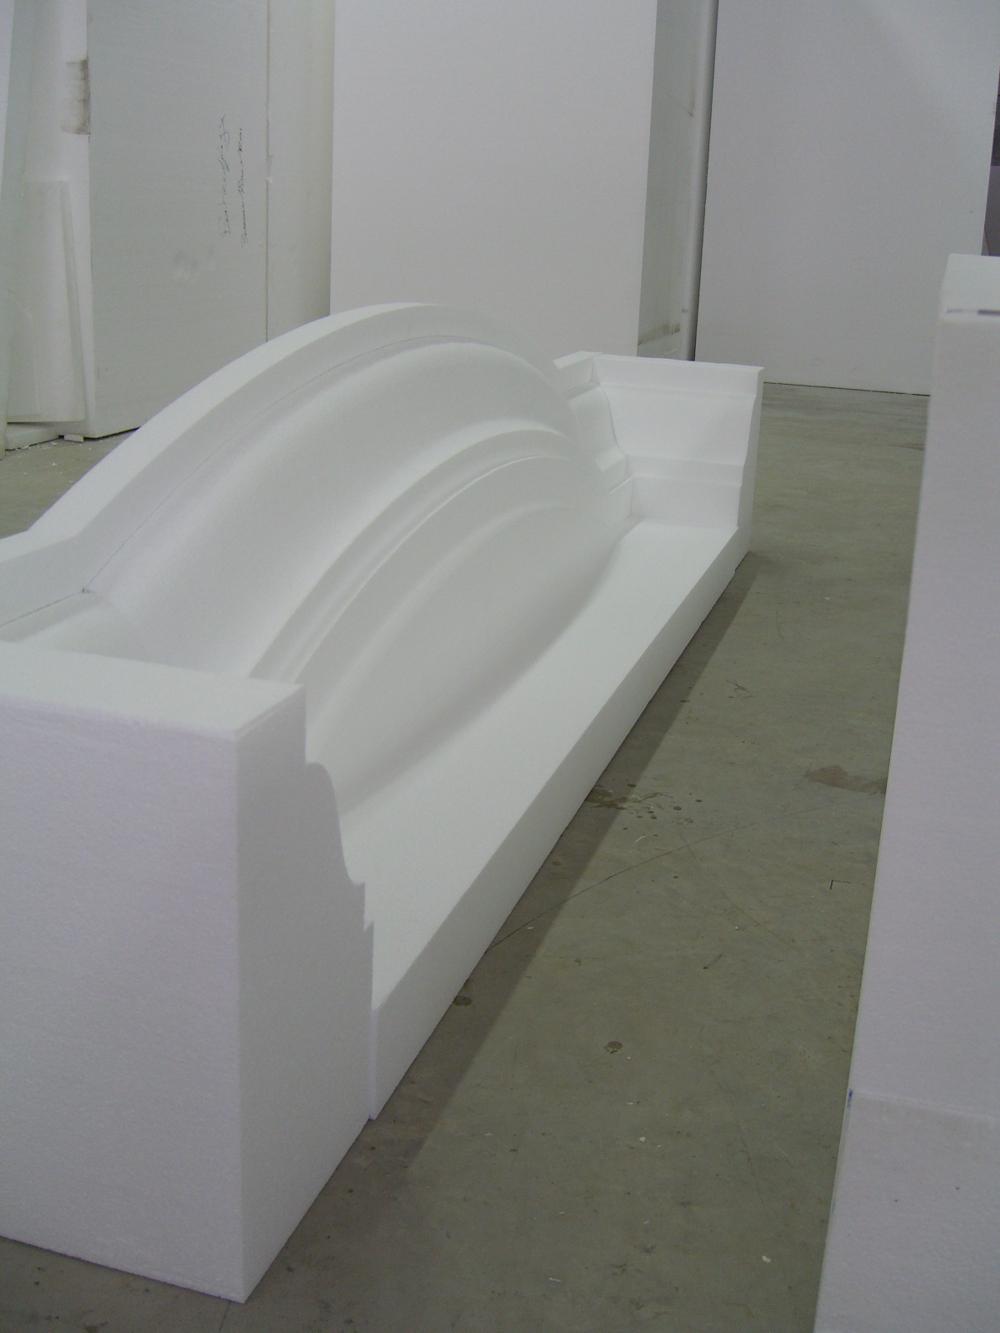 livraison coffrage polystyr ne sur bati coffrage. Black Bedroom Furniture Sets. Home Design Ideas